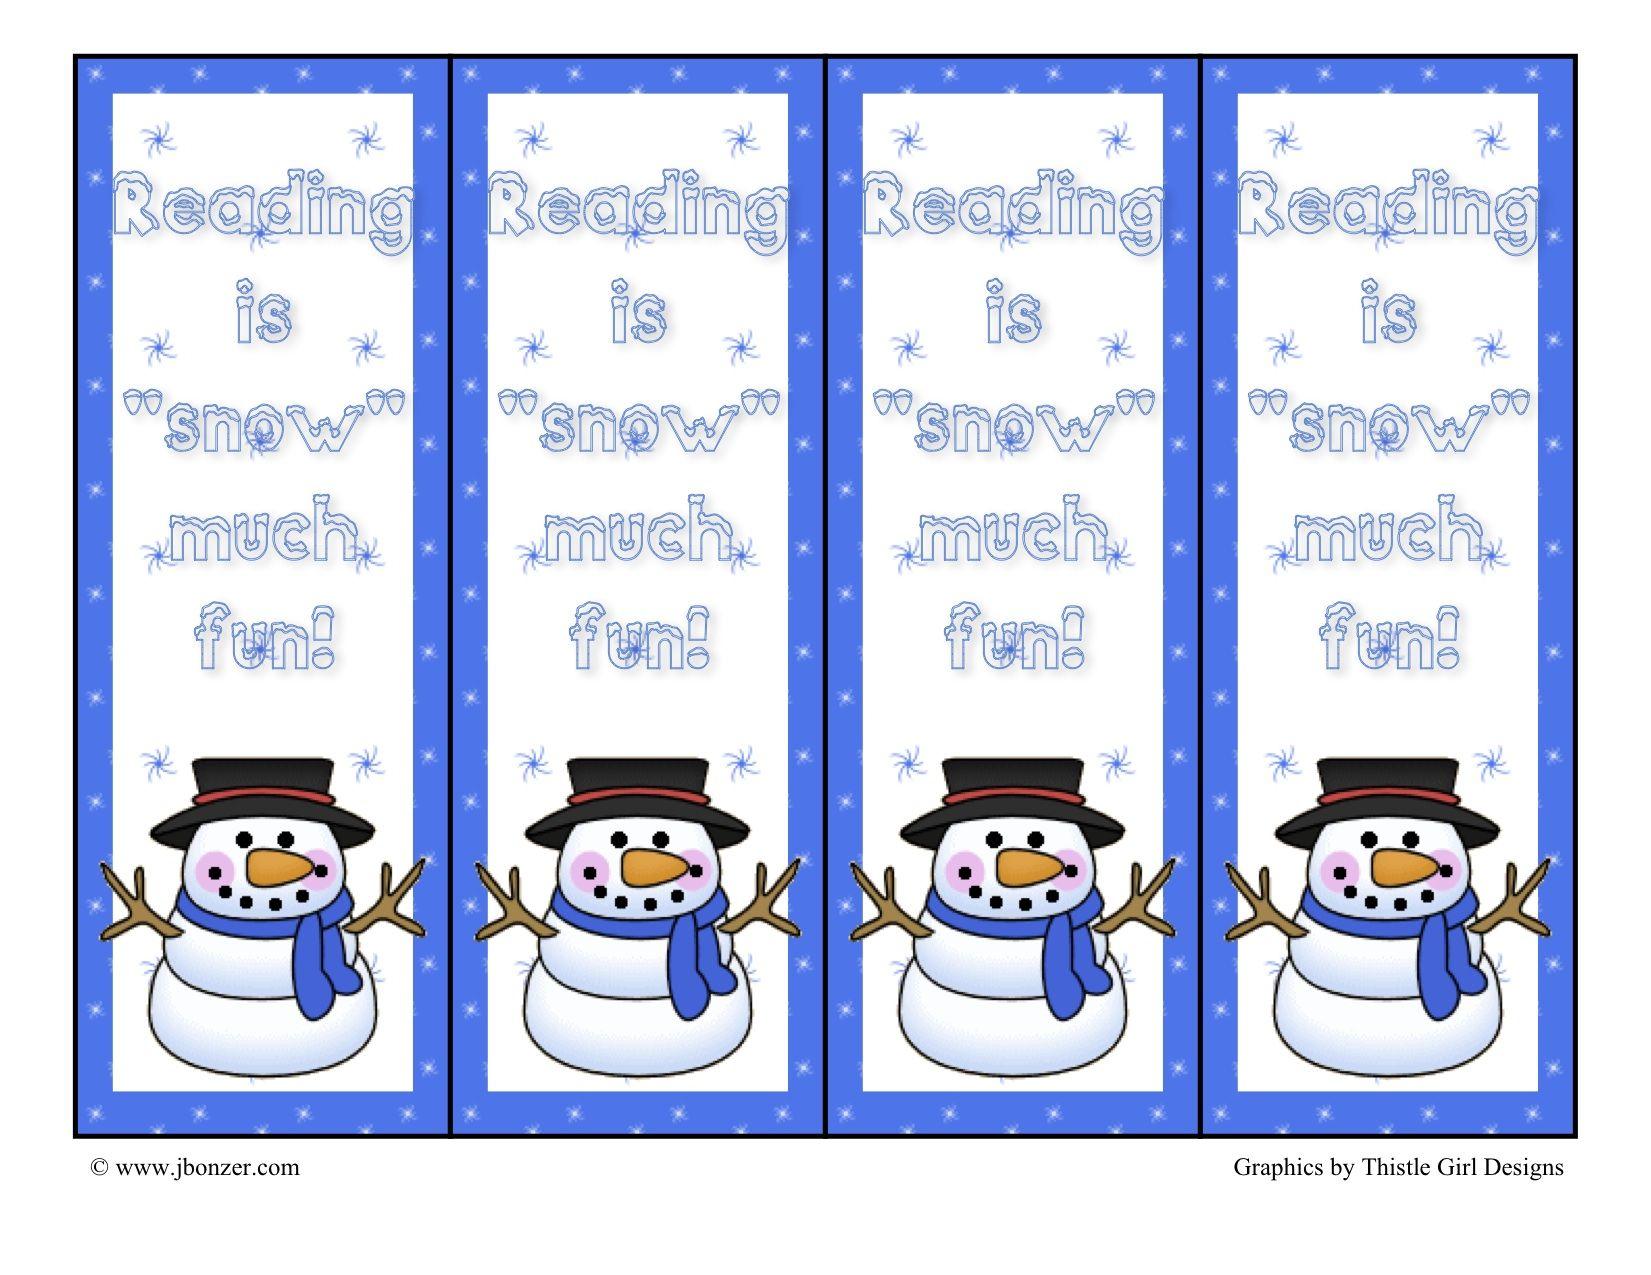 Snowman Printable Images